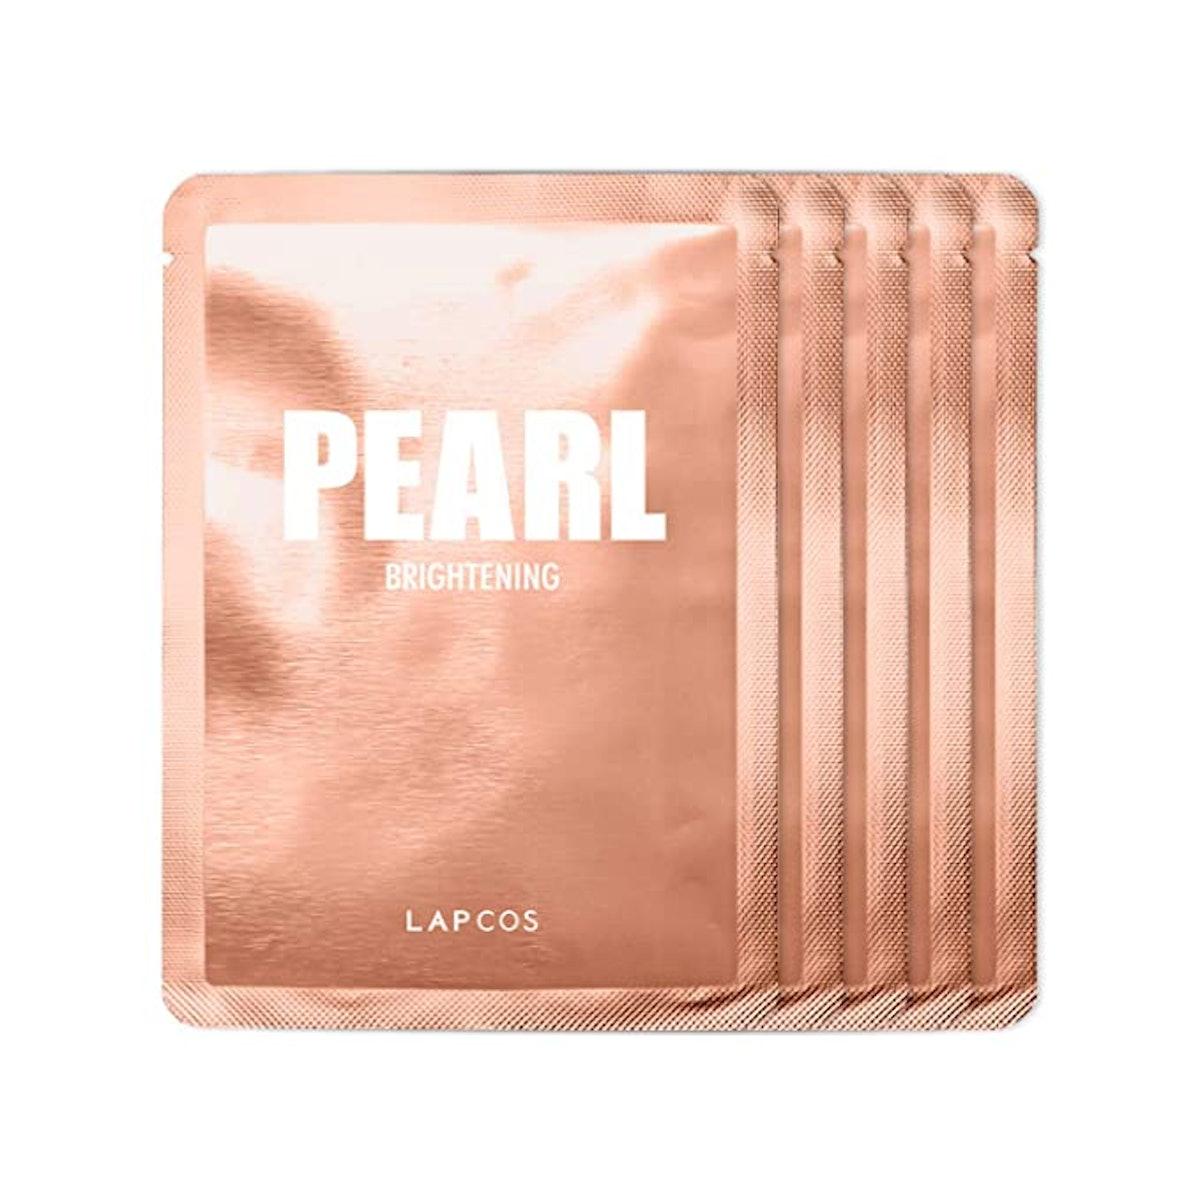 LAPCOS Pearl Sheet Mask (5-Pack)